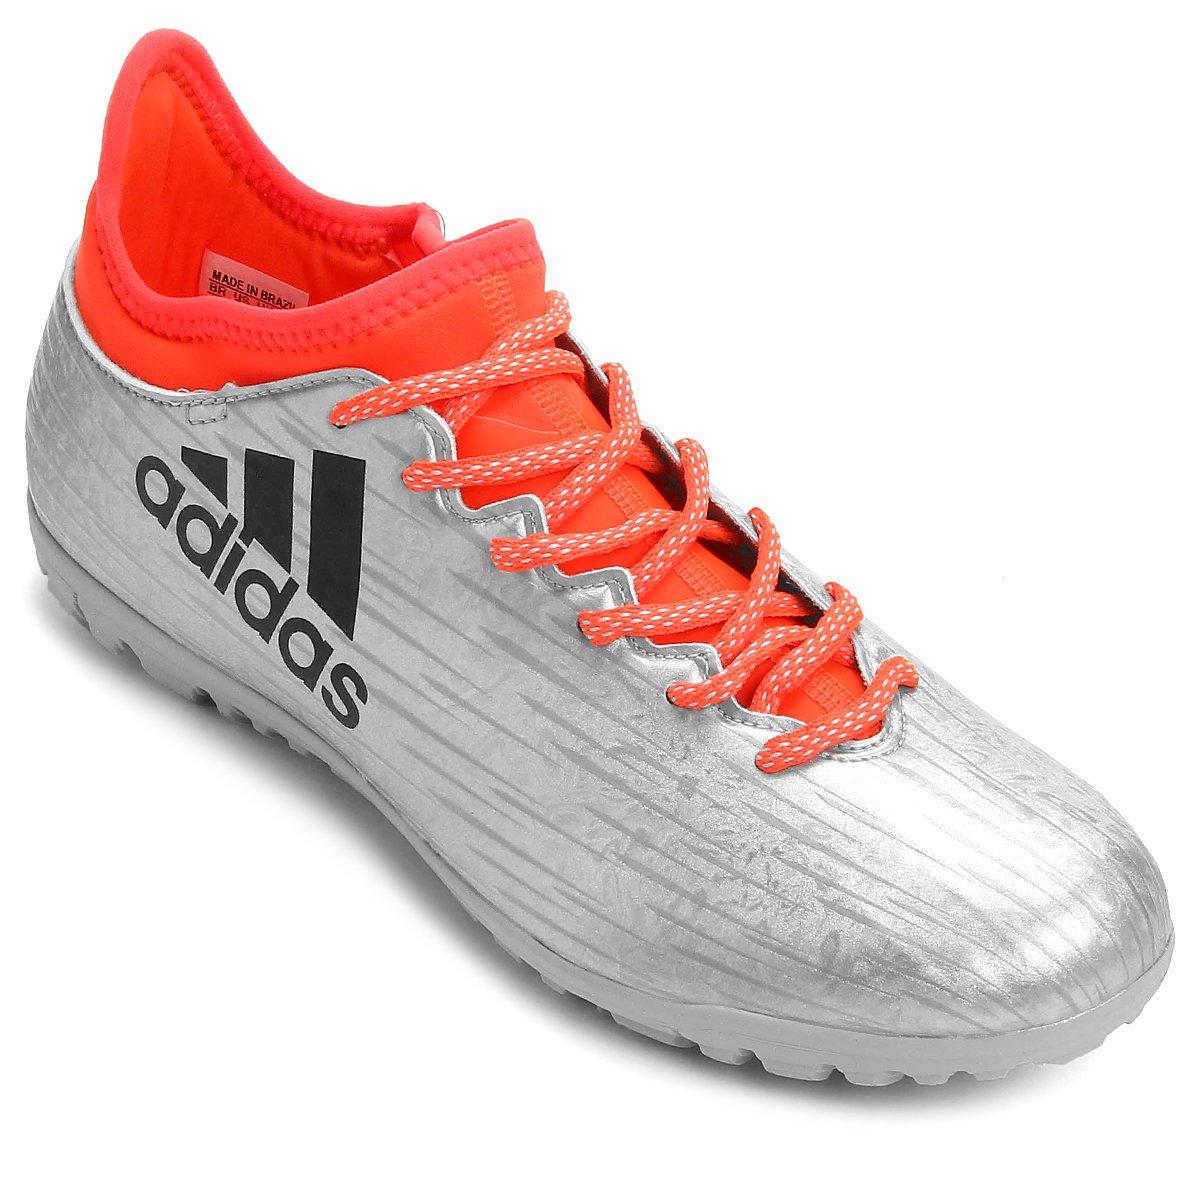 50103f13c6215 Chuteira Adidas X 16.3 TF Society - Compre Agora